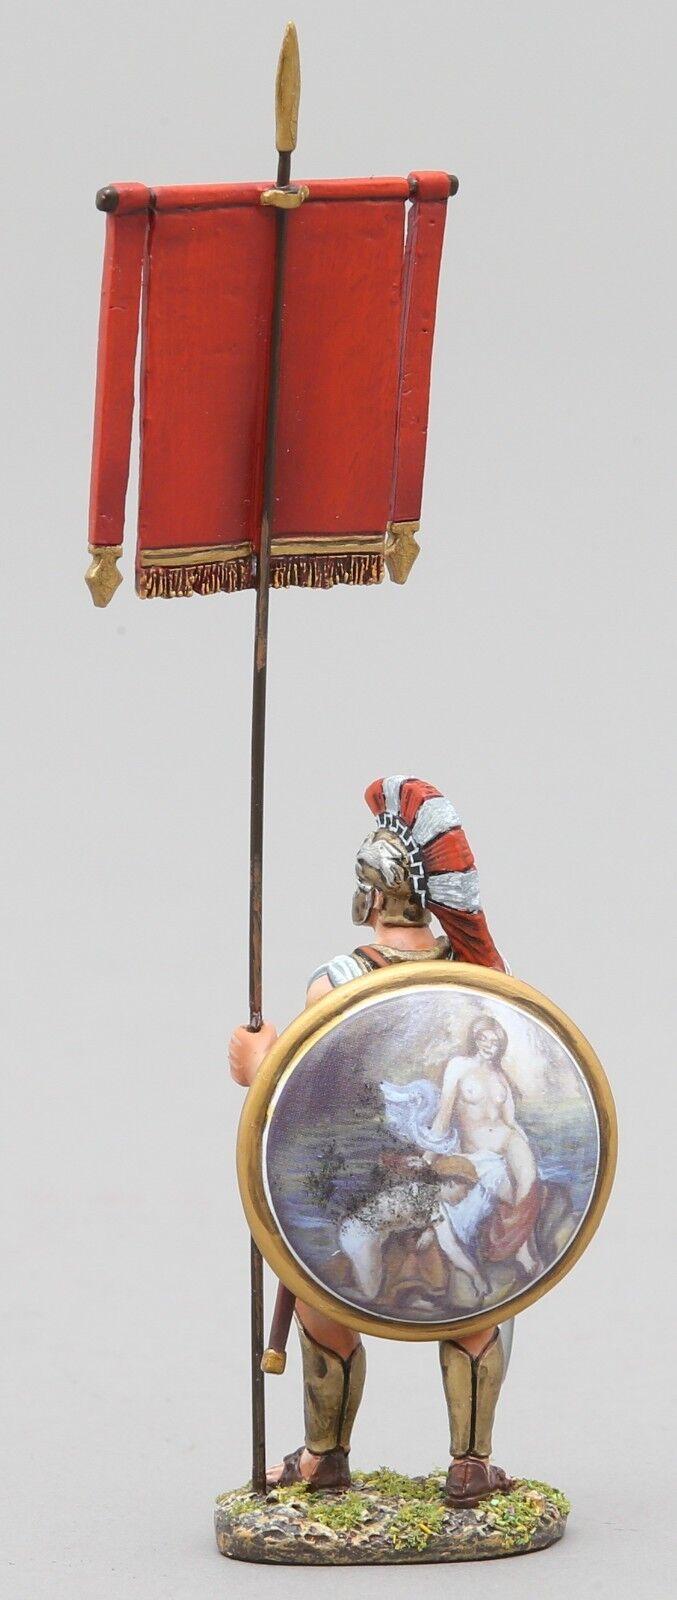 THOMAS GUNN ANCIENT GREEKS & PERSIANS SPA020D HOPLITE WITH RED BANNER DIANA MIB